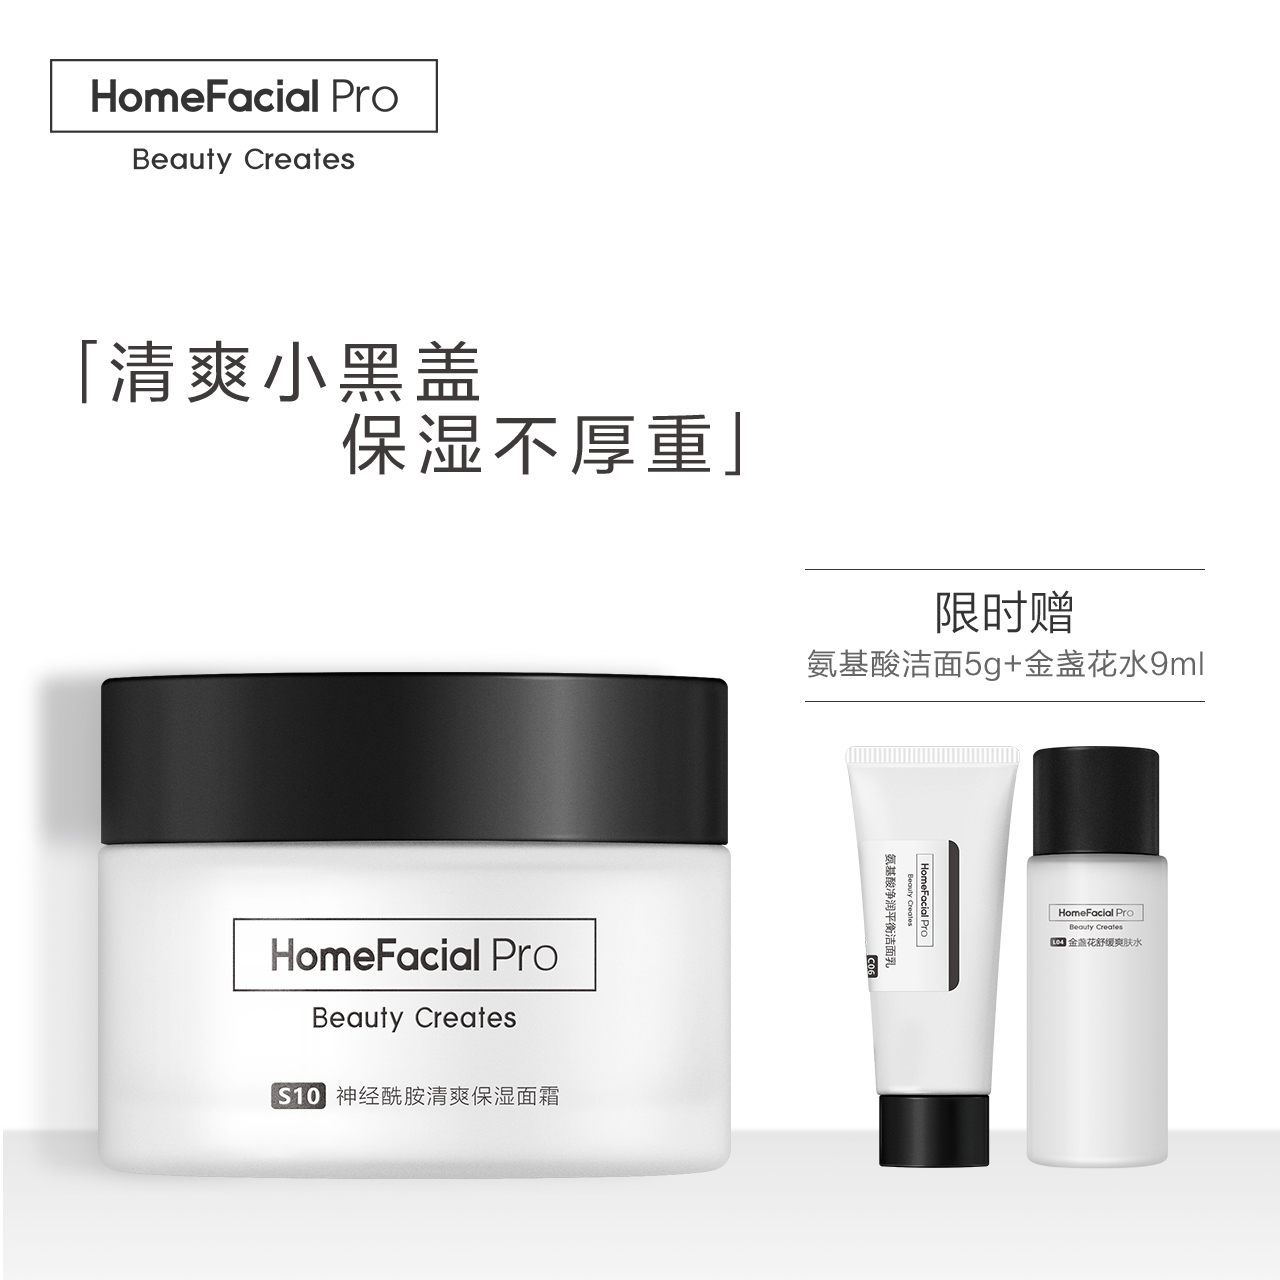 HomeFacialPro神经酰胺清爽保湿面霜 补水保湿滋润日霜正品男女士